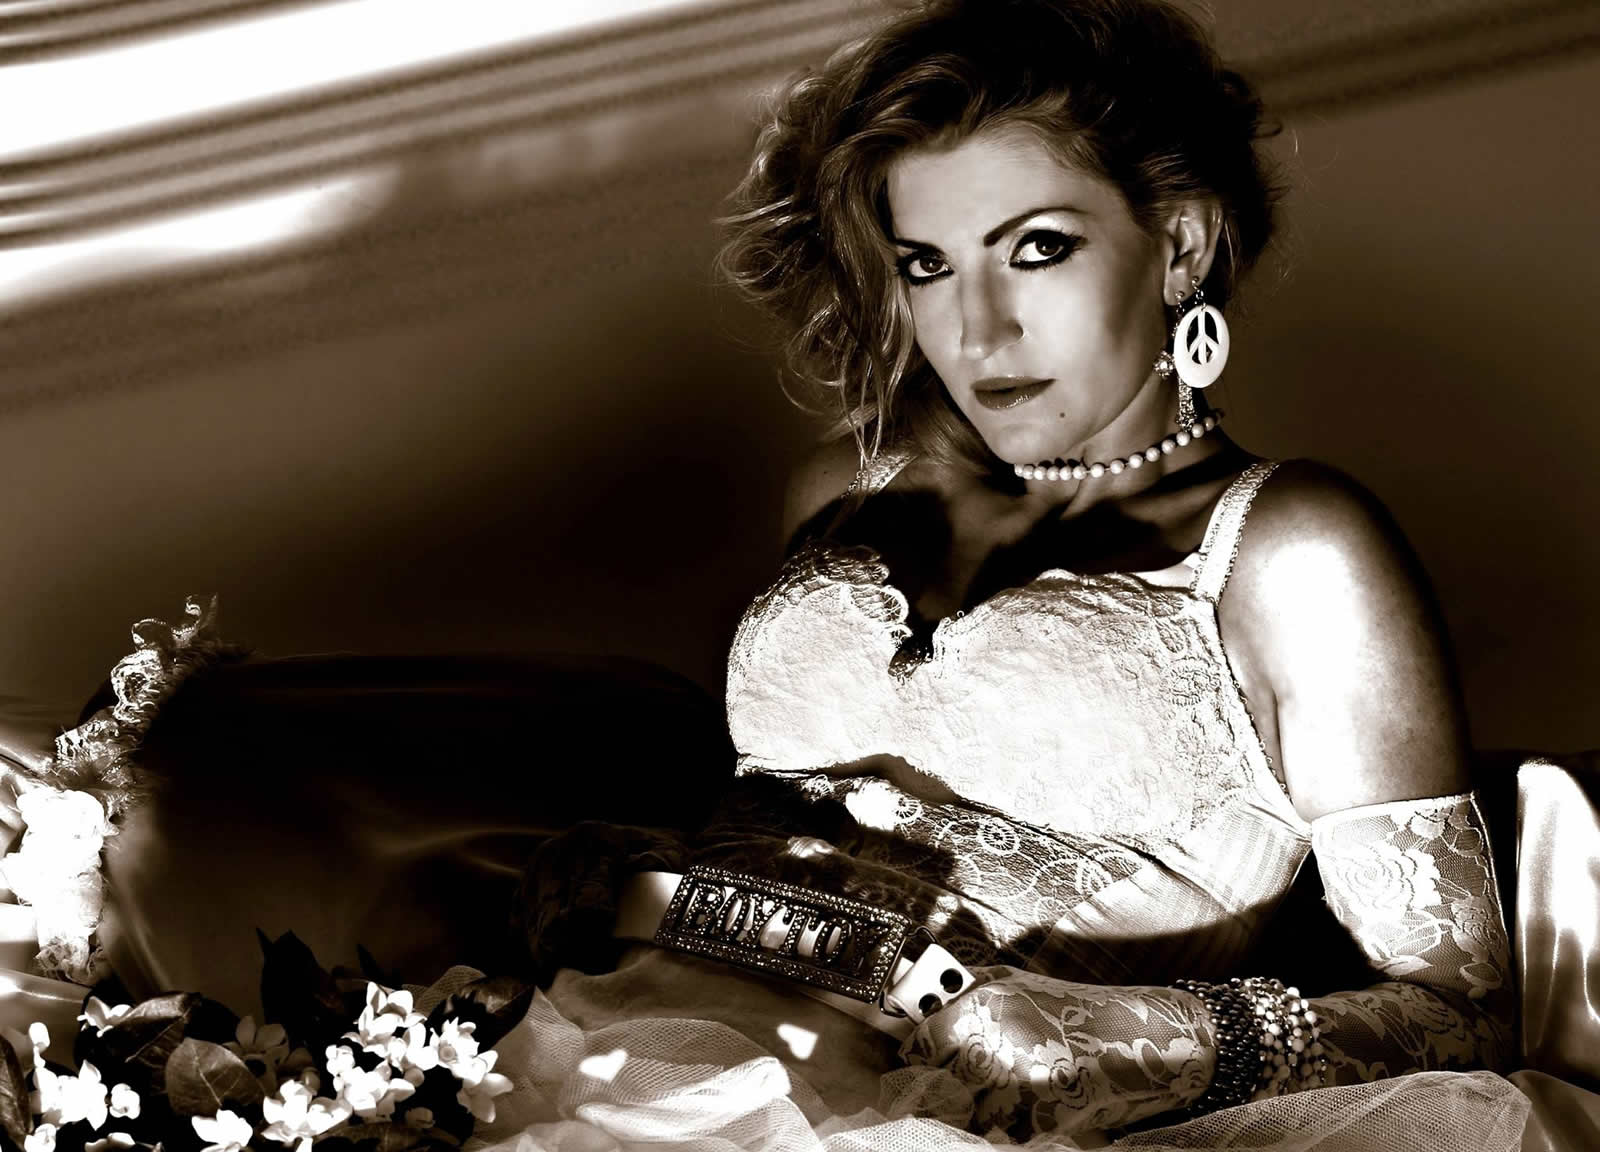 Vogue - A Tribute To Madonna – Live Music at Red Bar & Restaurant Weybridge Surrey